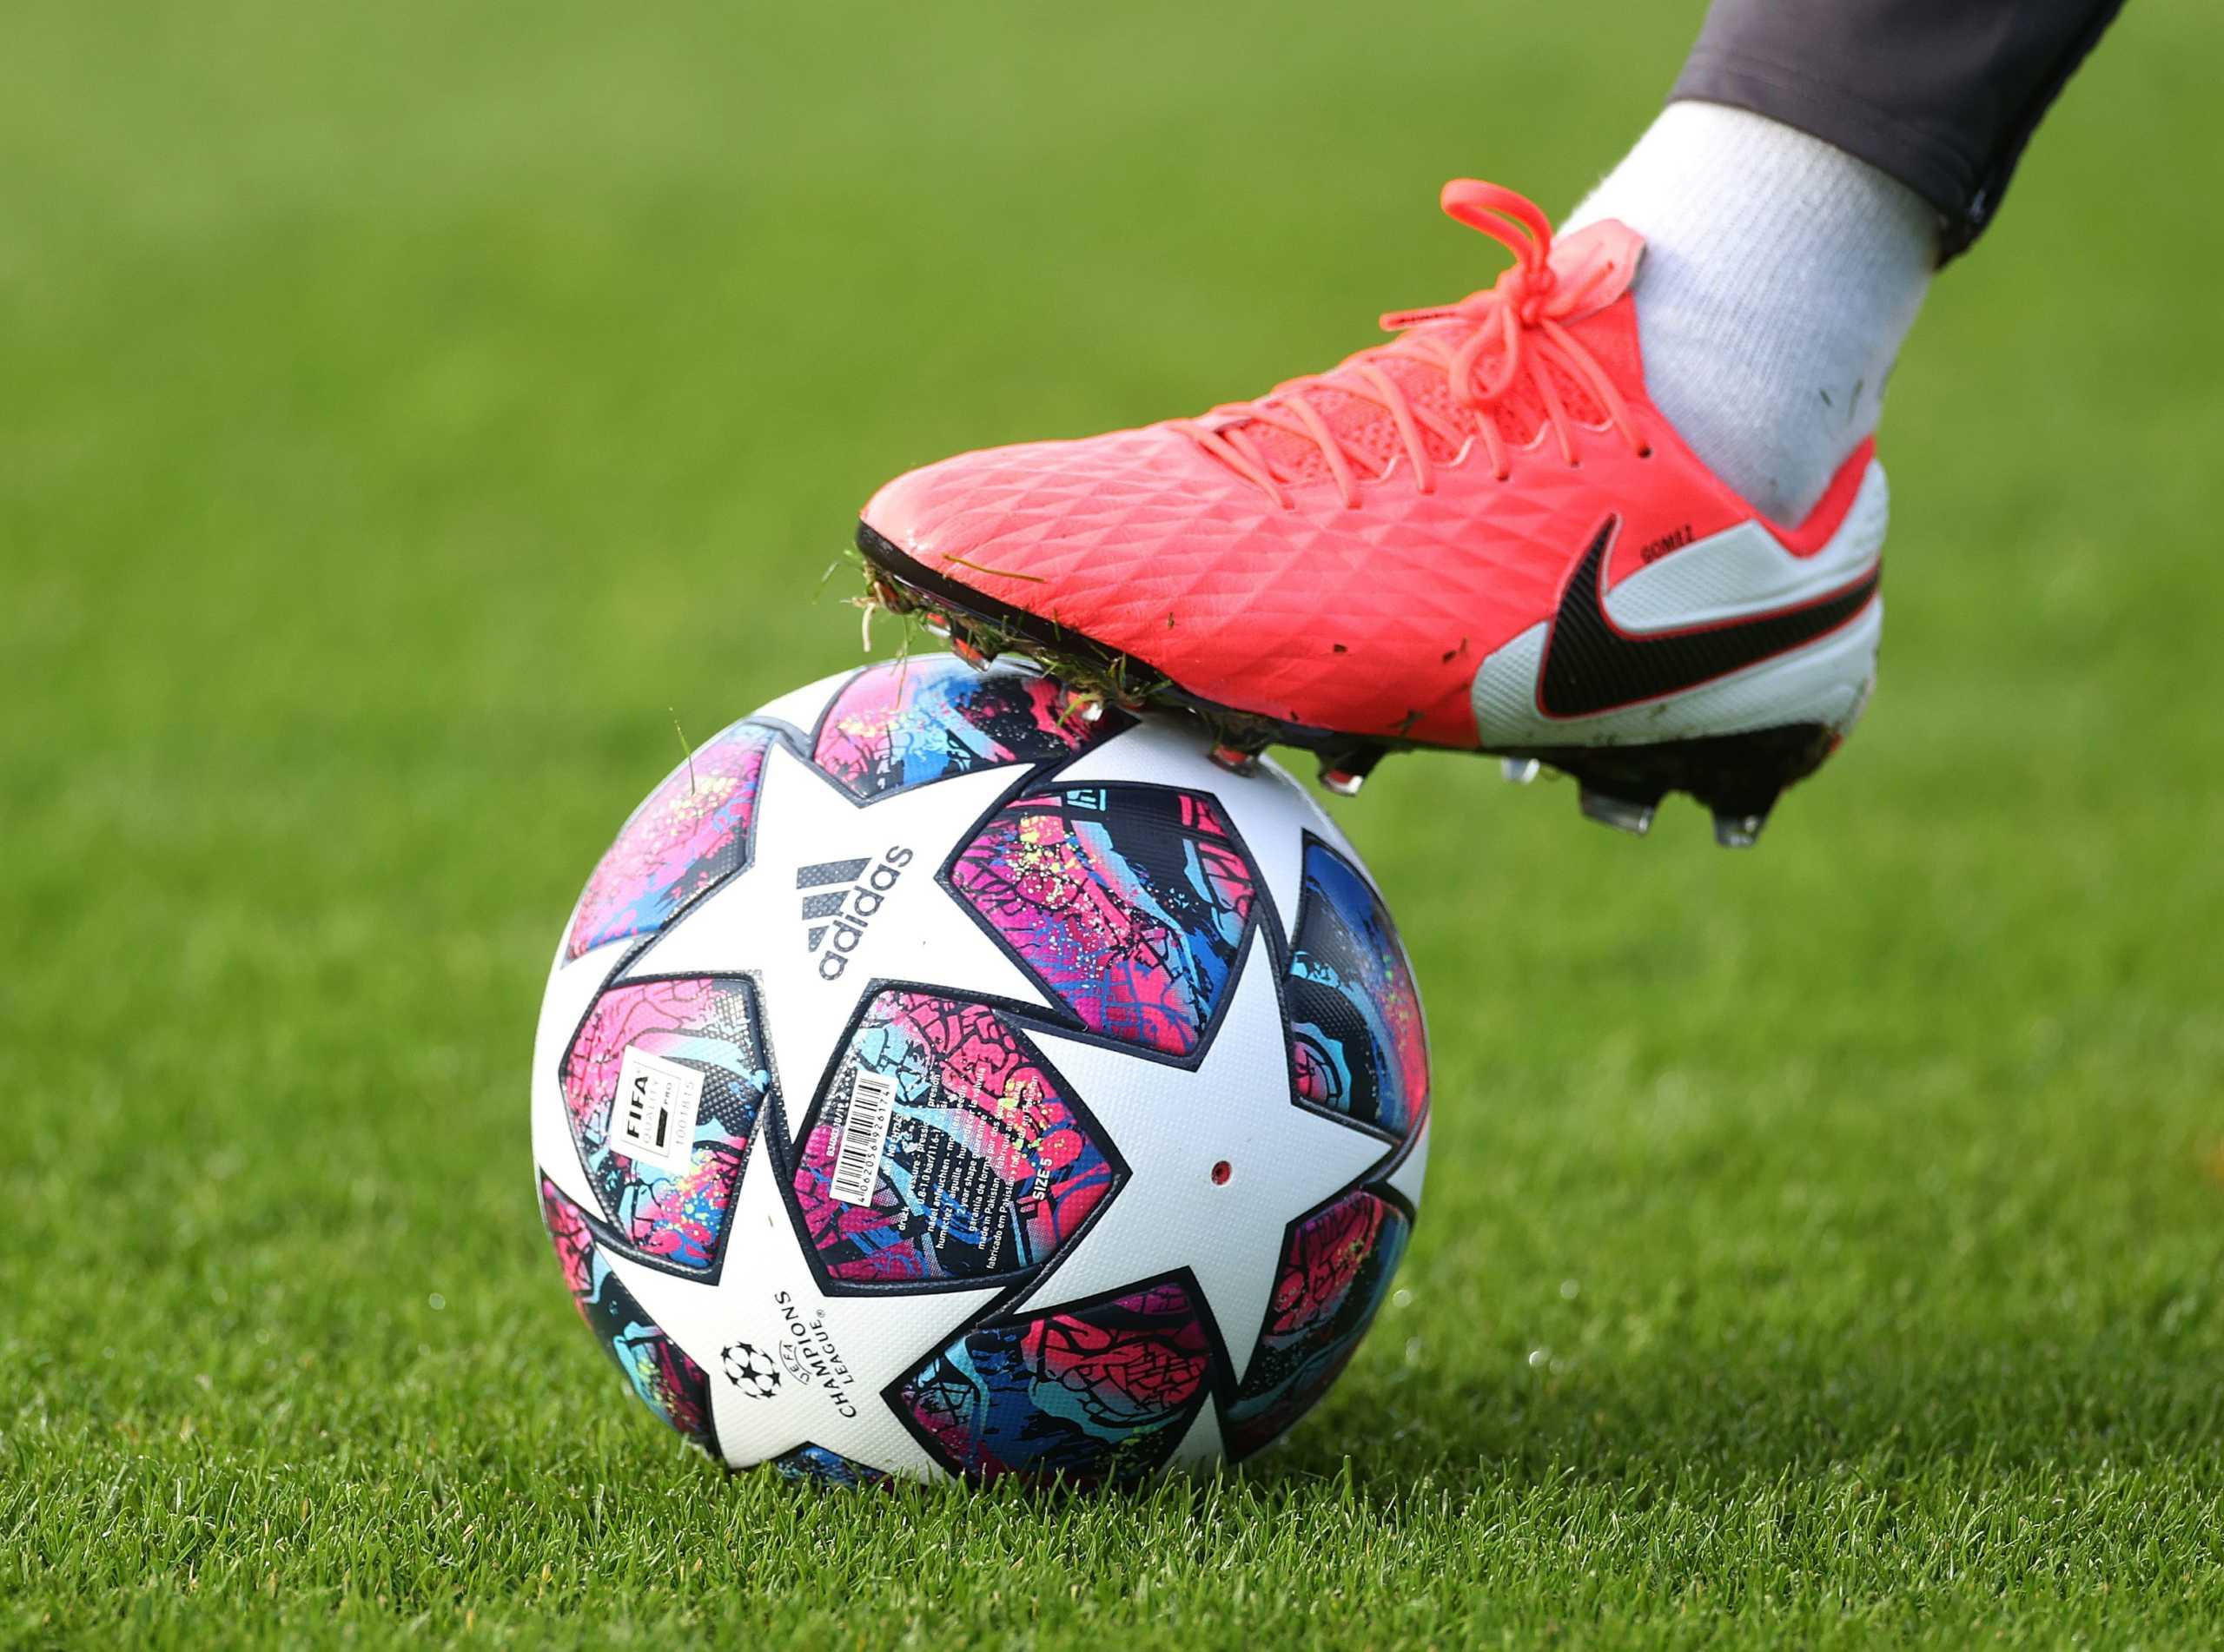 Champions League: Αποκαλύφθηκε η μπάλα του τελικού! pics